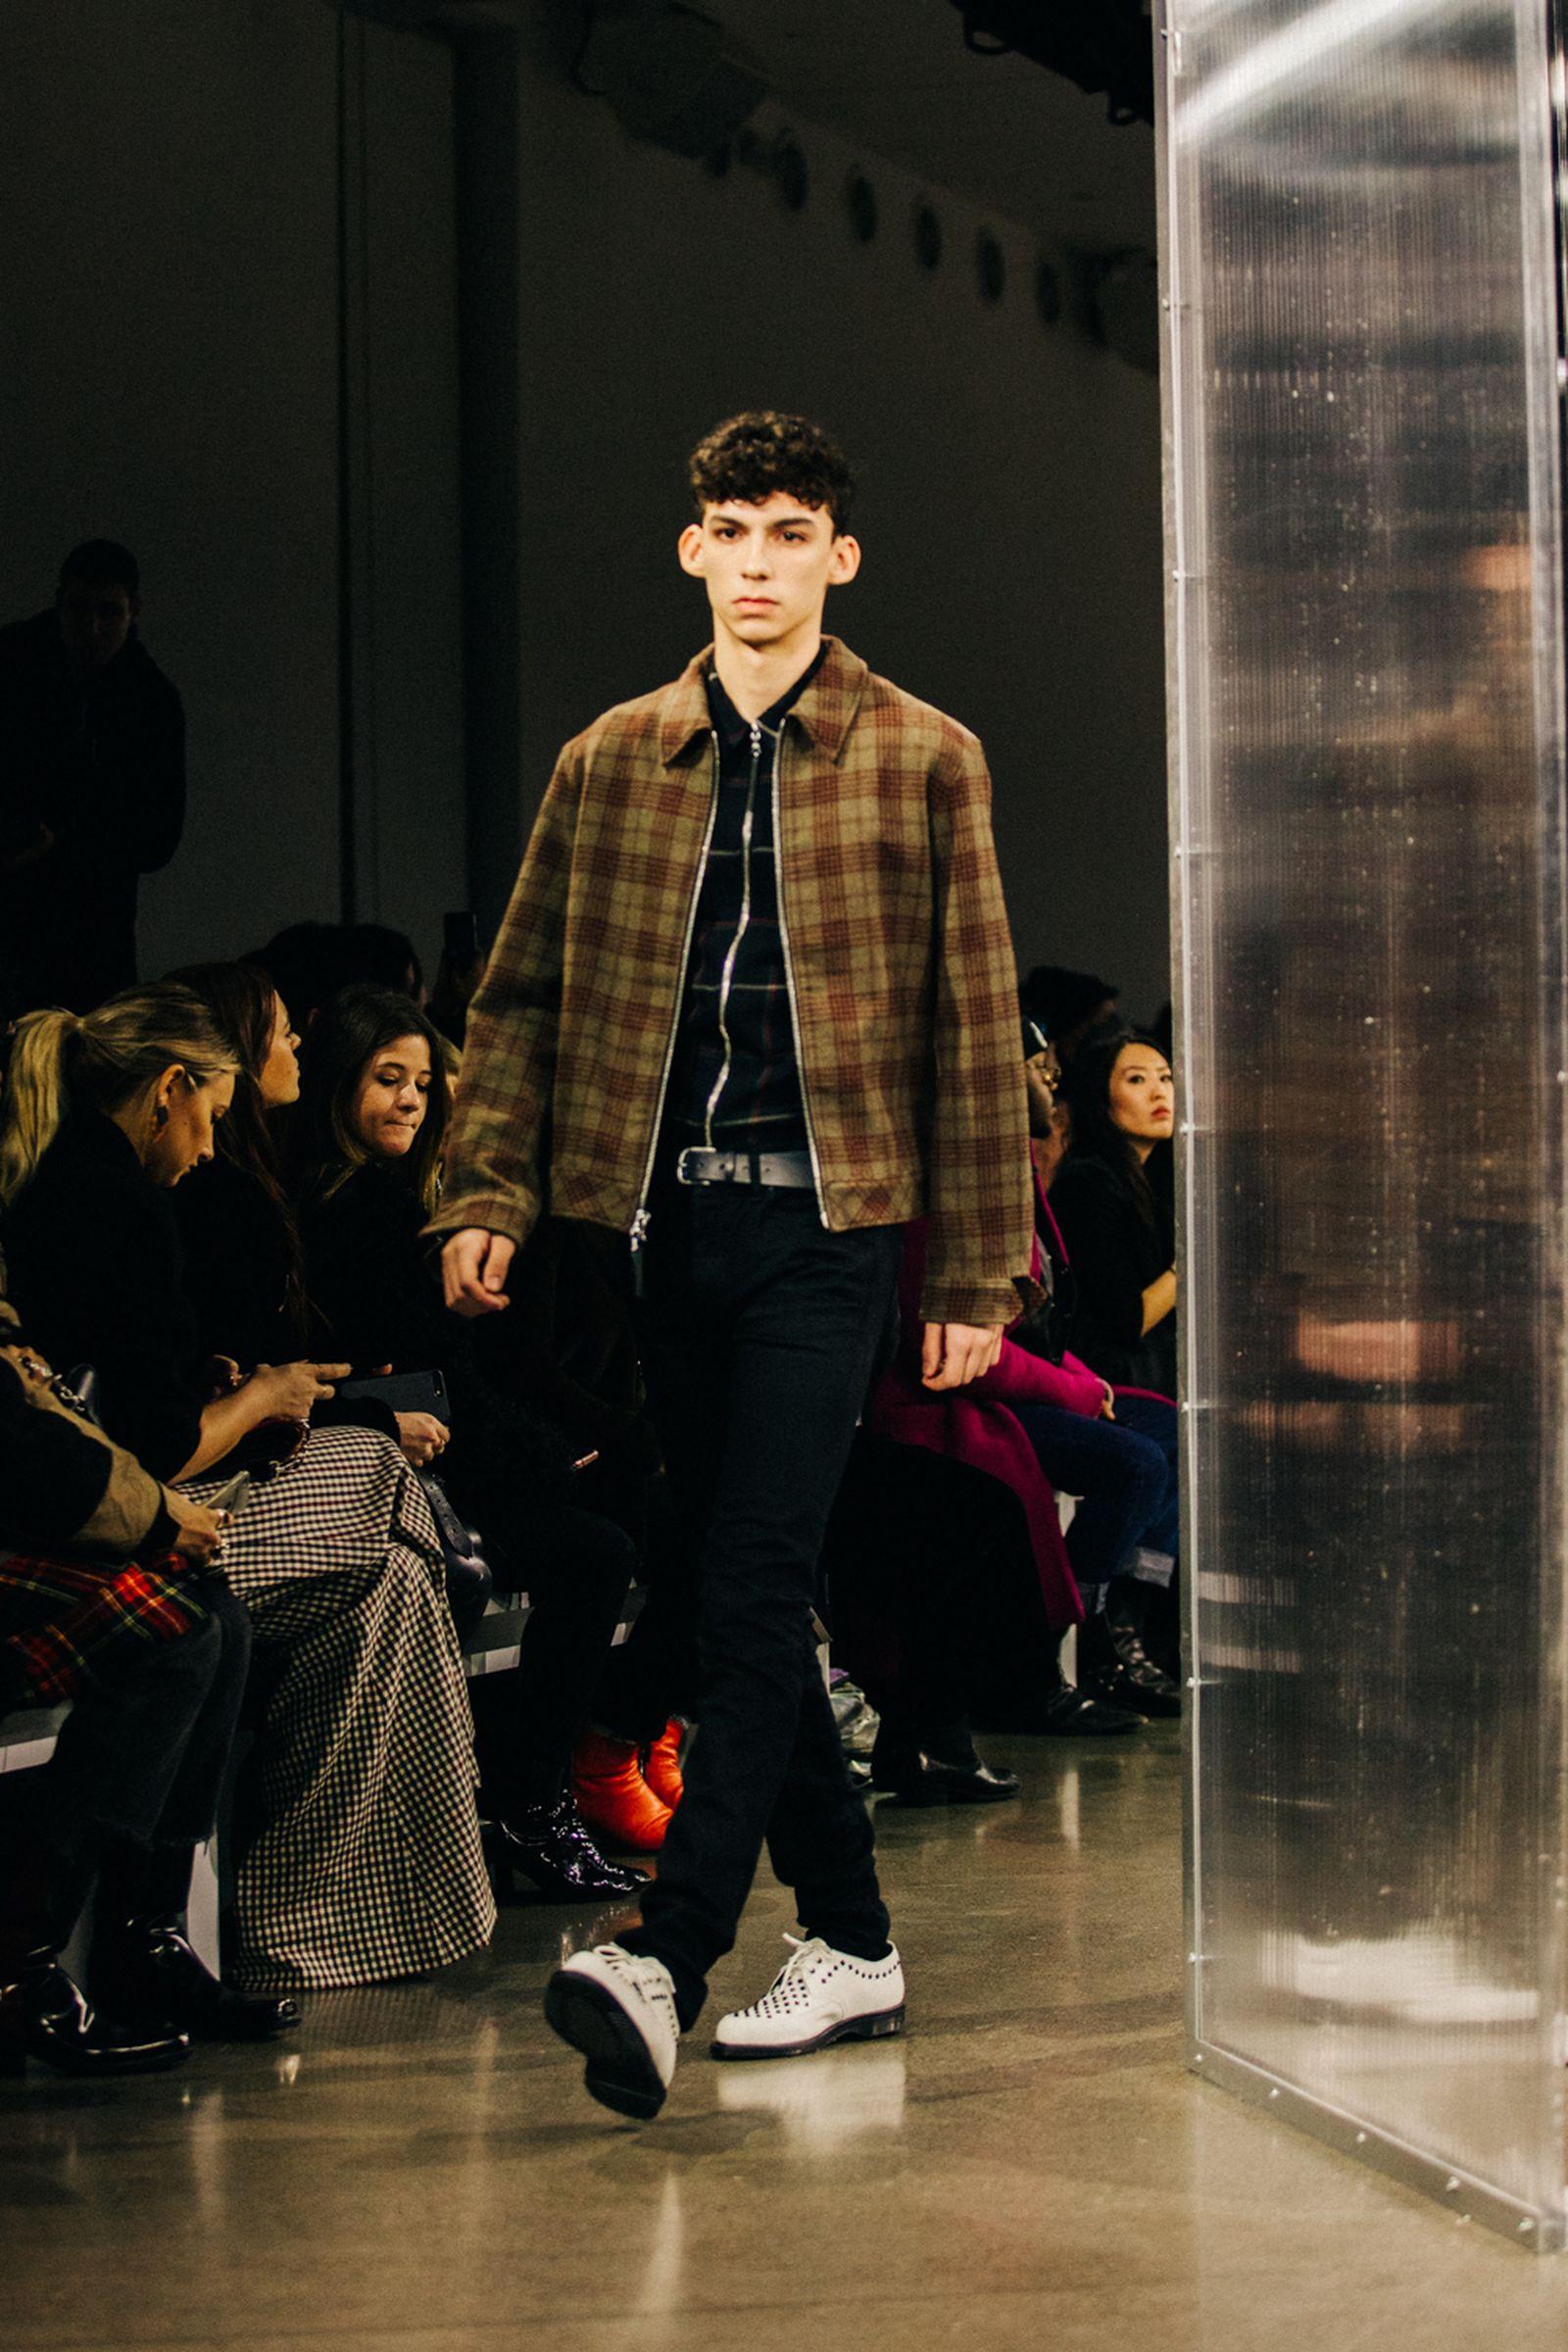 john elliot fw 18 highsnobiety fall winter 2018 john elliott new york fashion week